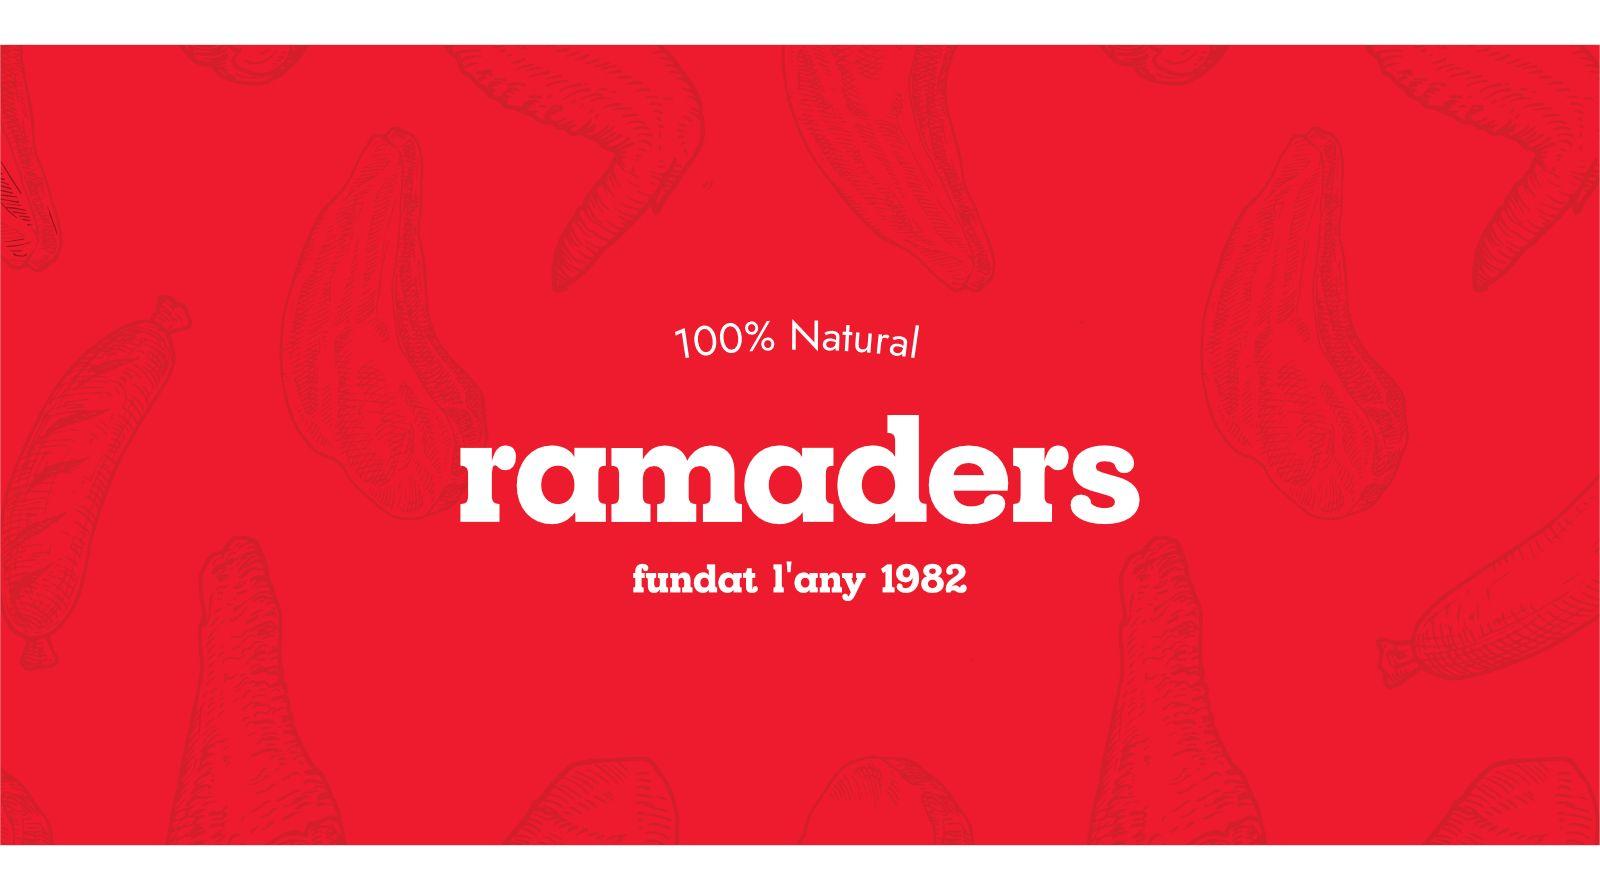 Ramaders agrupats